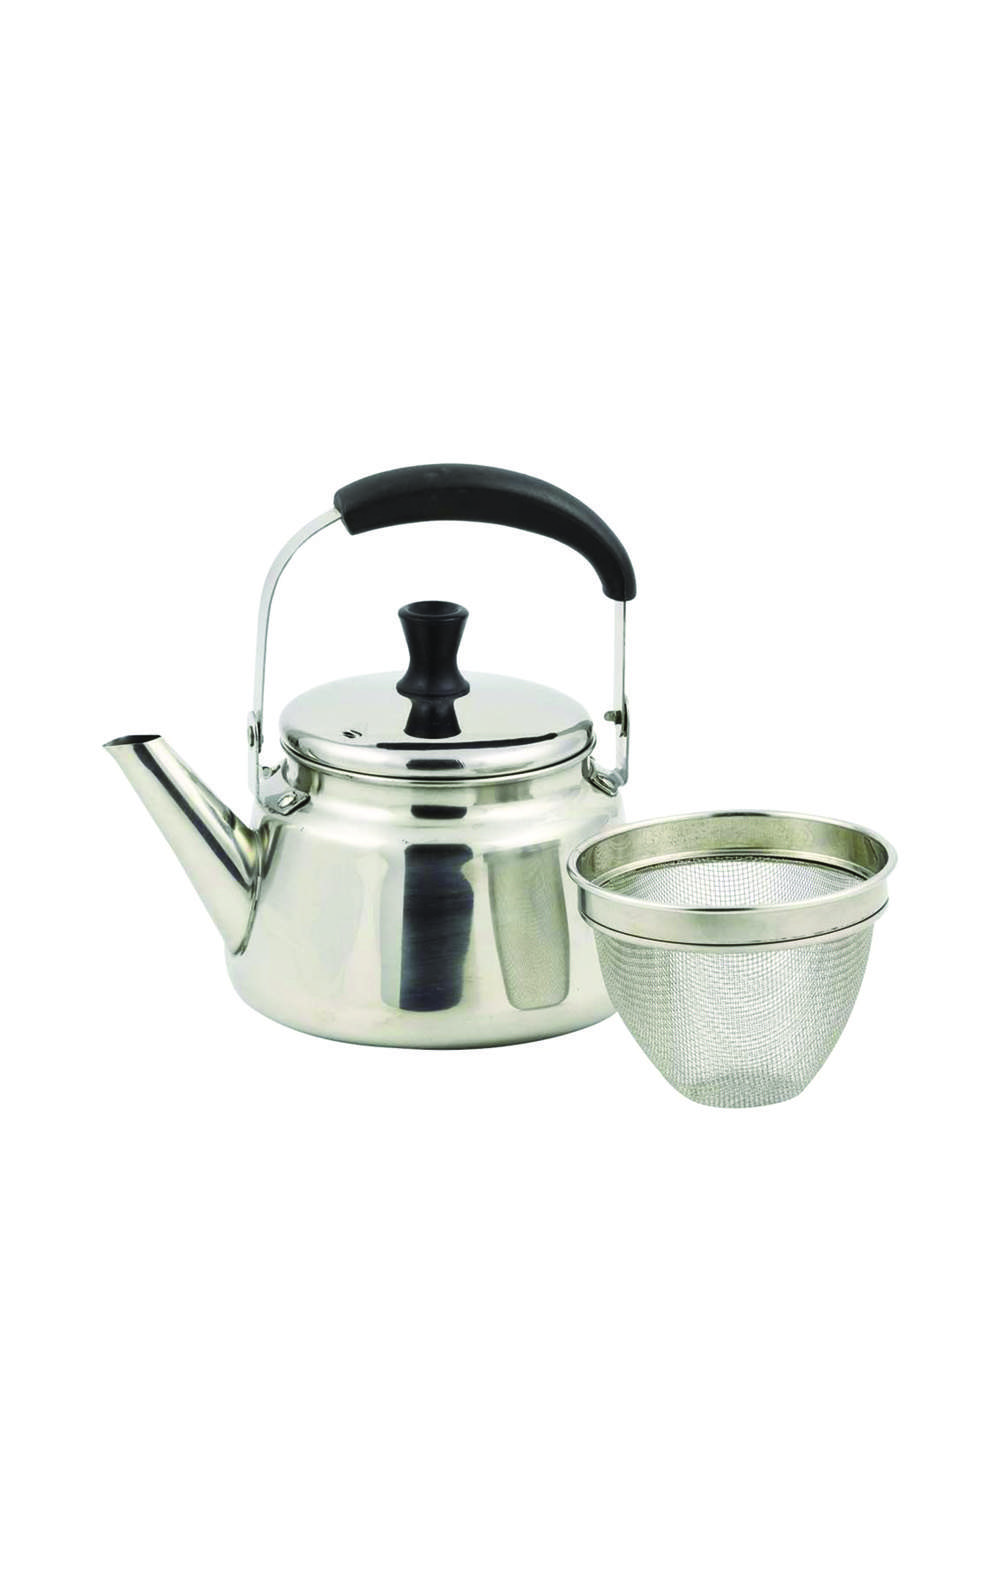 Pearl Metal   HB-4417 Kettle Silver 1.2L IH Compatible أبريق شاي